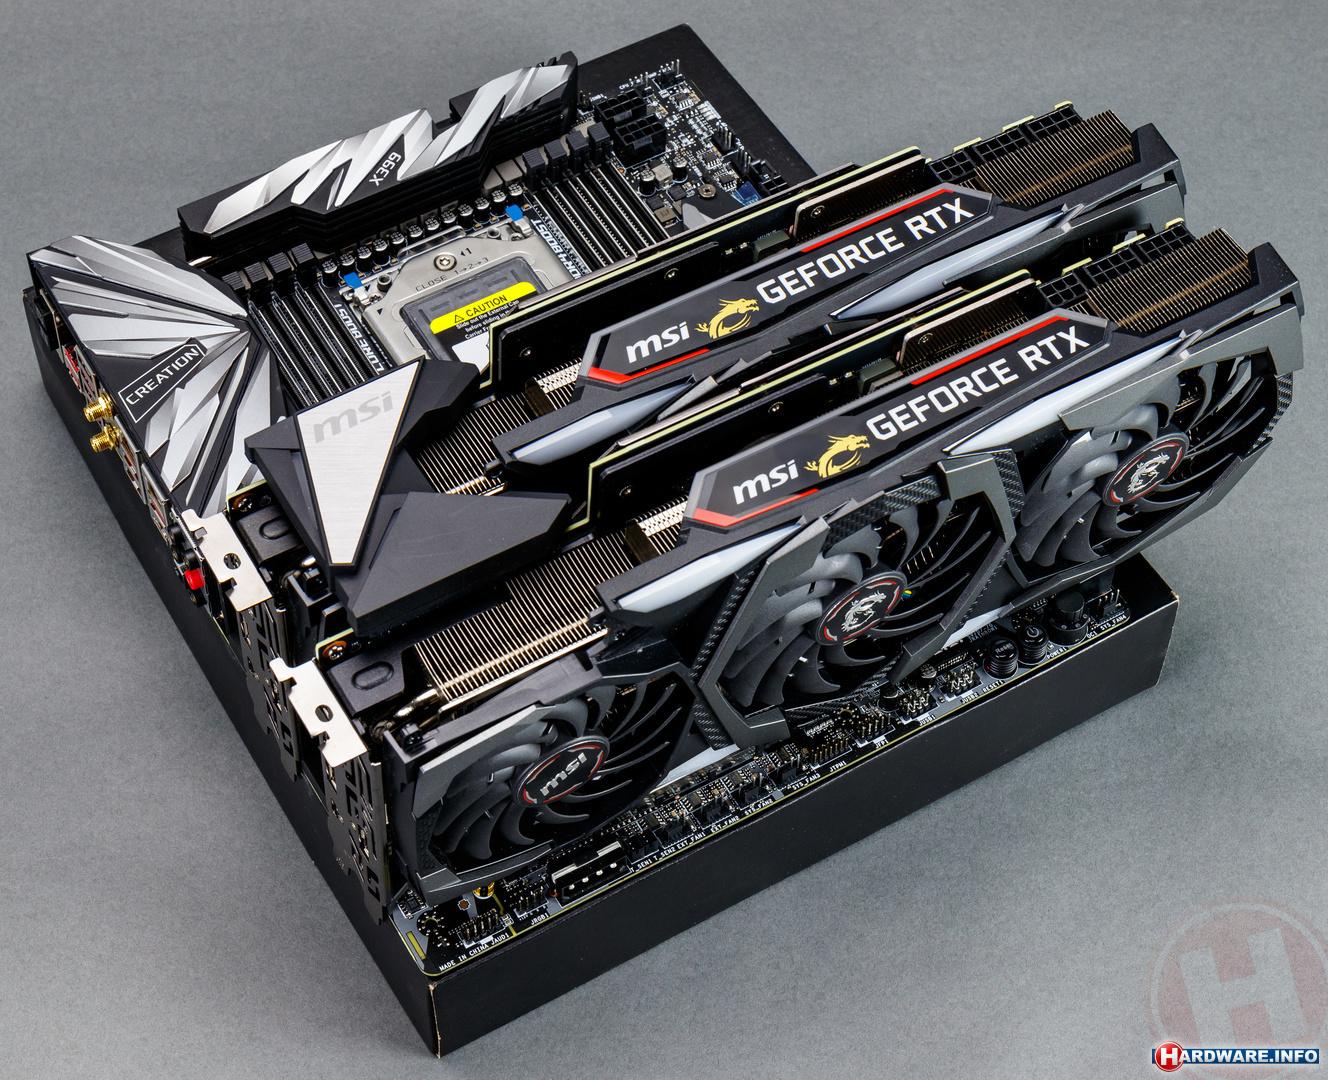 Nvidia GeForce RTX 2080 Ti SLI review: Turing in tweevoud